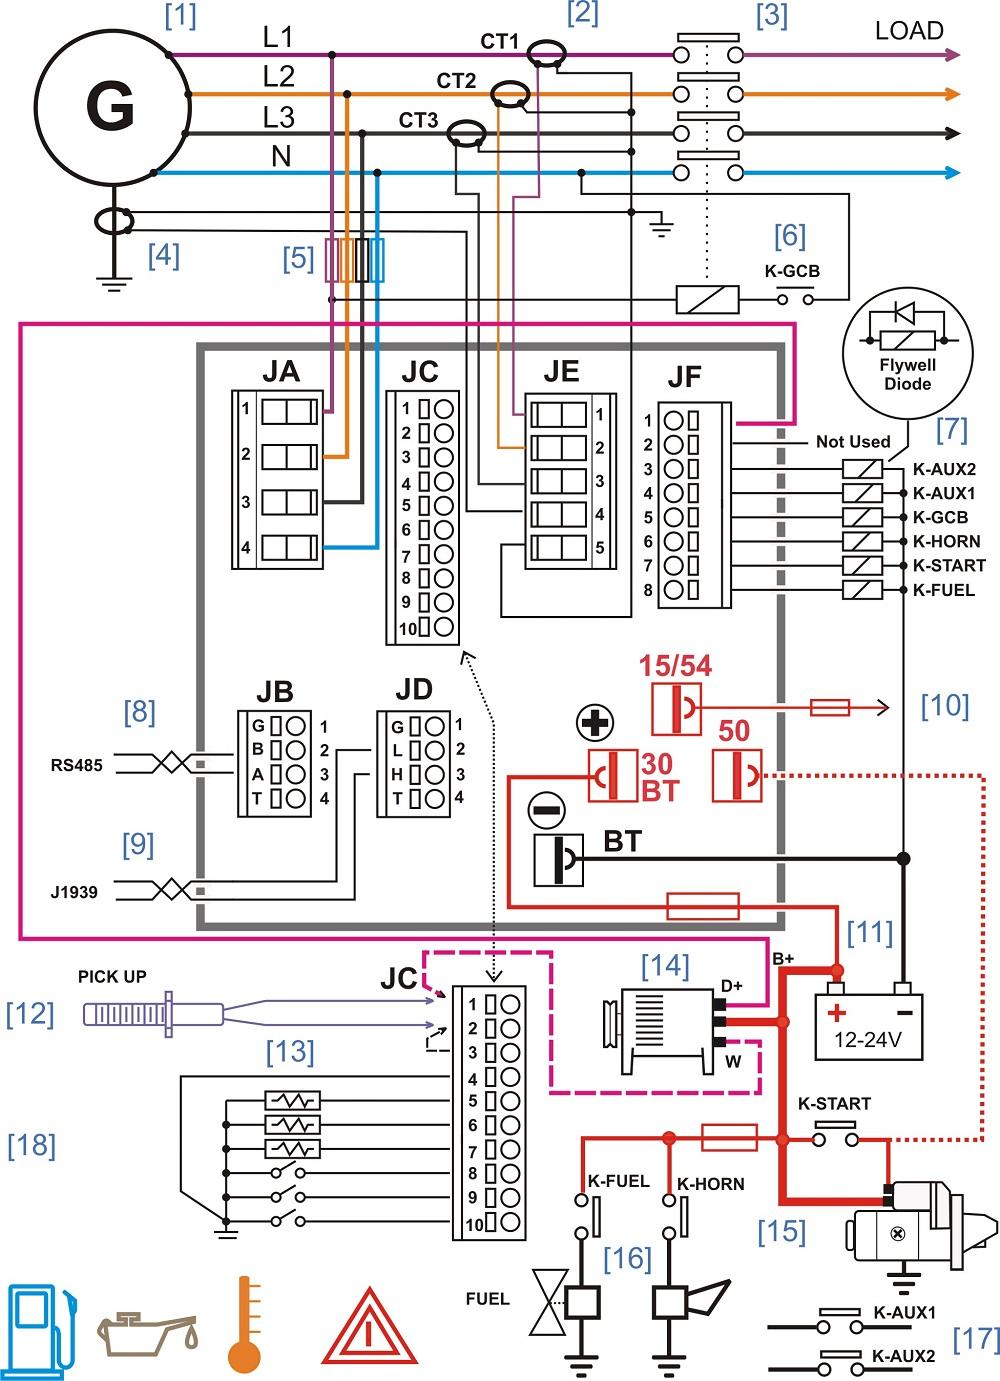 powerflex 753 wiring diagram powerflex 753 wiring diagram wiring diagram blog  powerflex 753 wiring diagram wiring